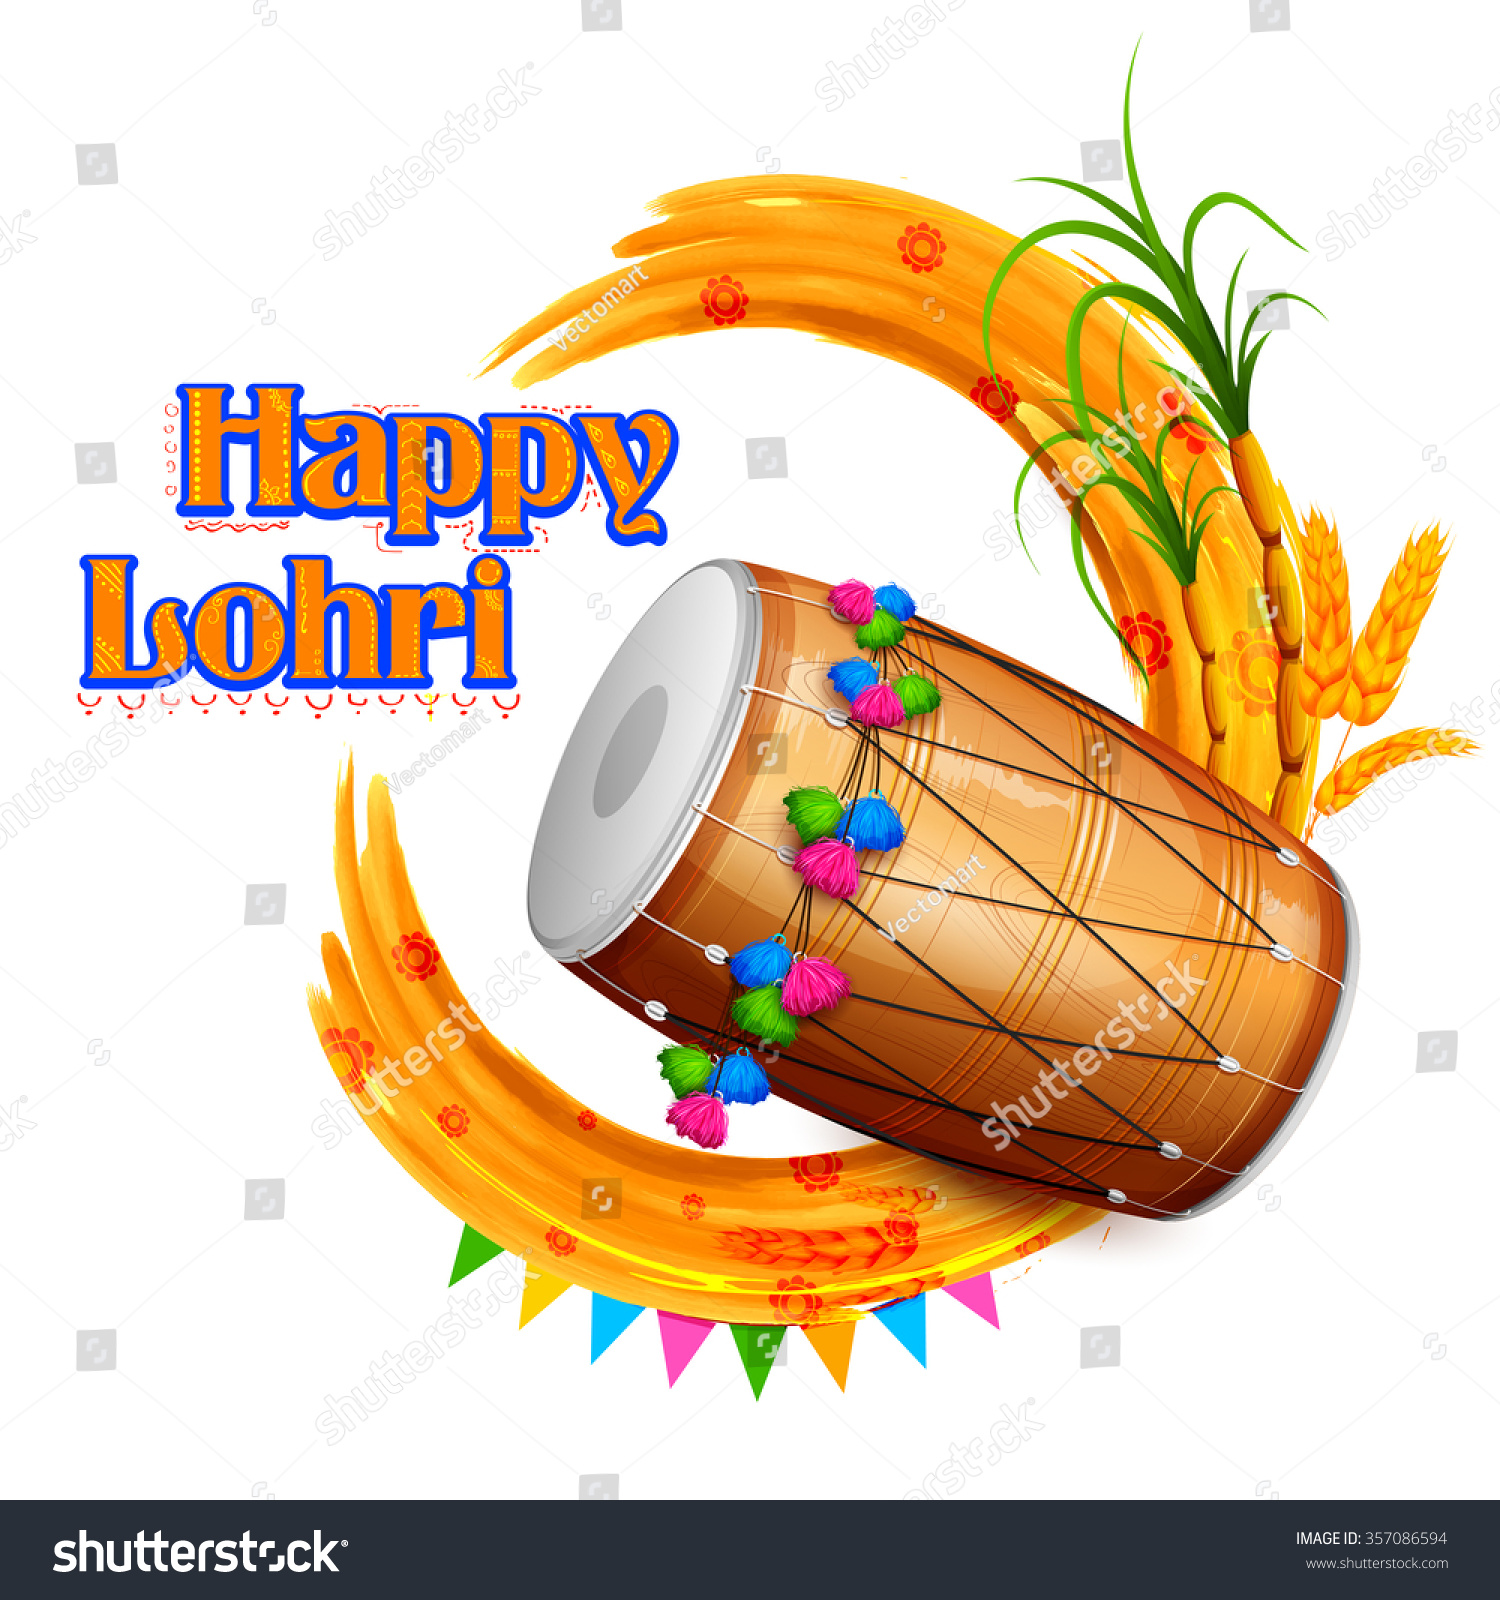 Illustration Happy Lohri Background Punjabi Festival Stock ...